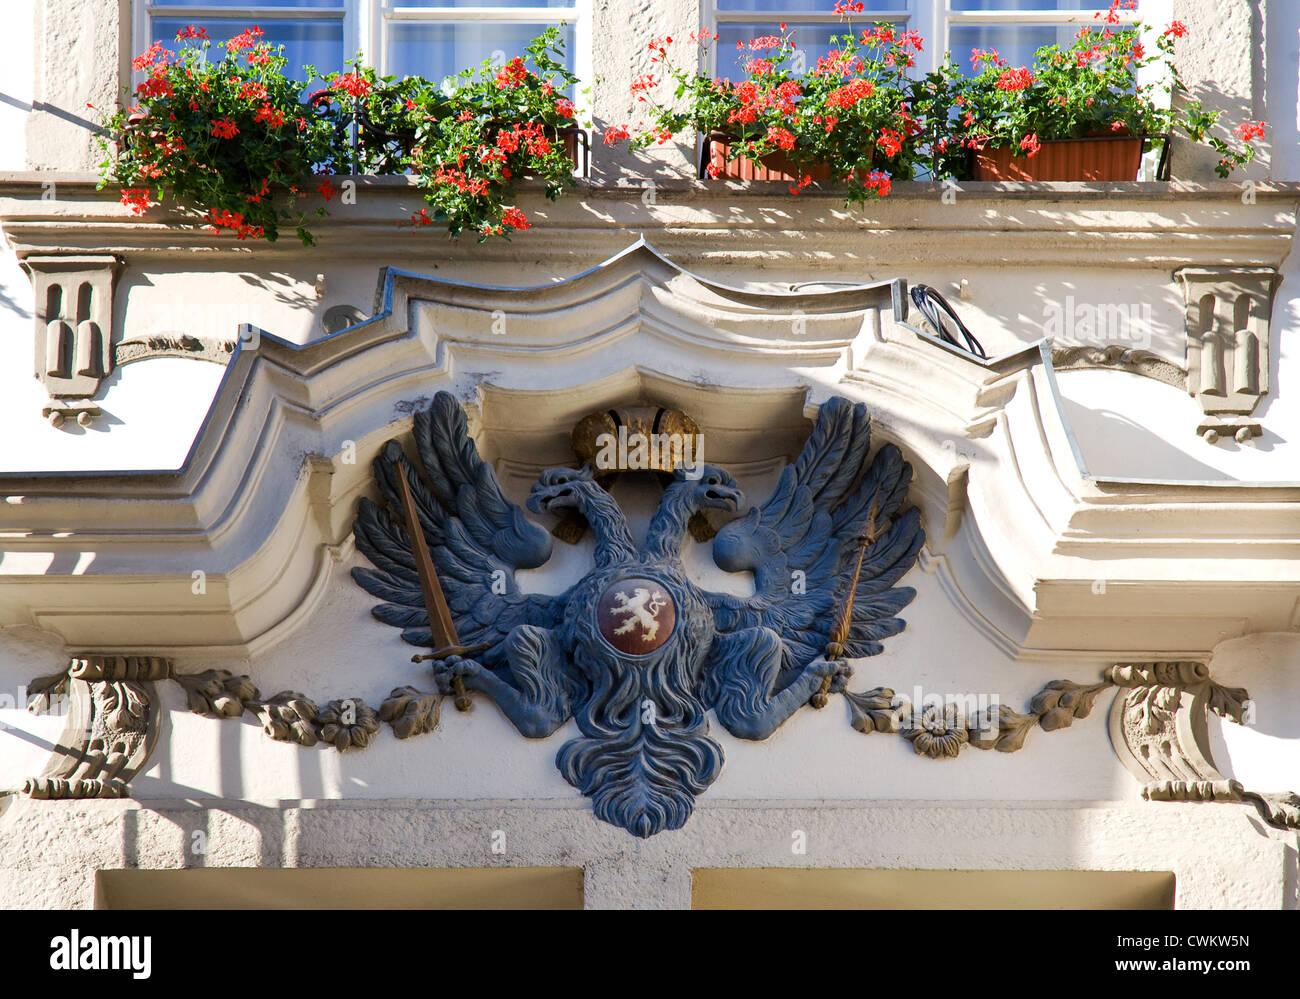 Dum U cerneho vola, Mostecka ulice, Mala Strana (UNESCO), Praha, Ceska republika - Stock Image